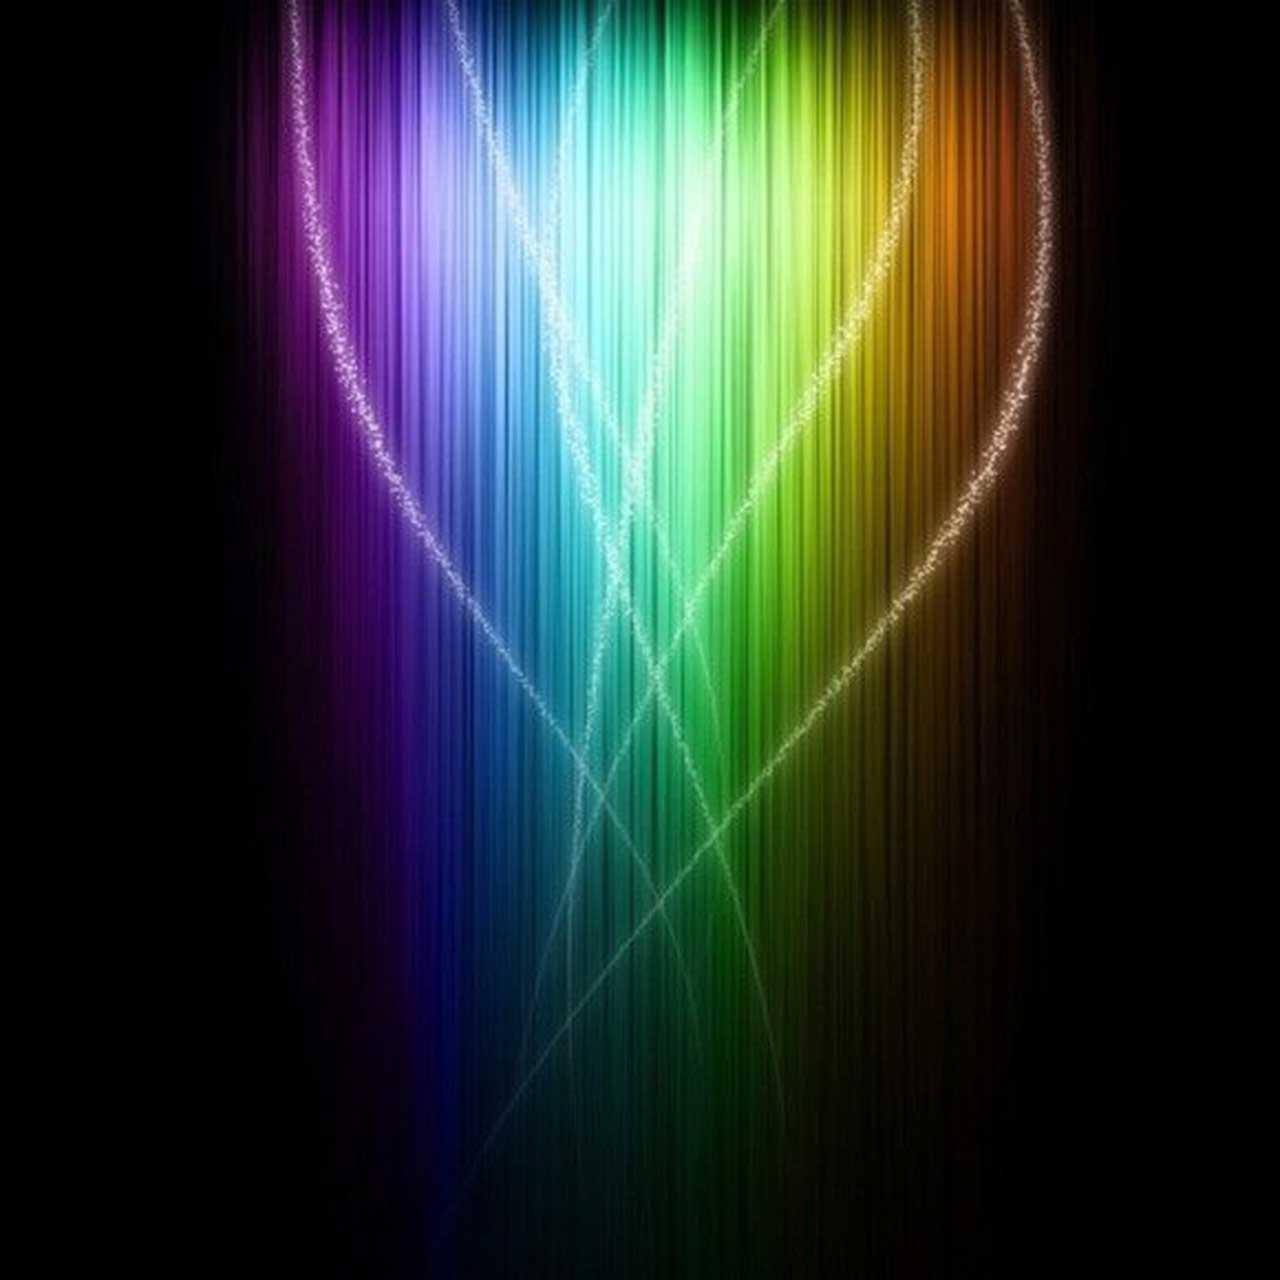 wallpaper color light swirls